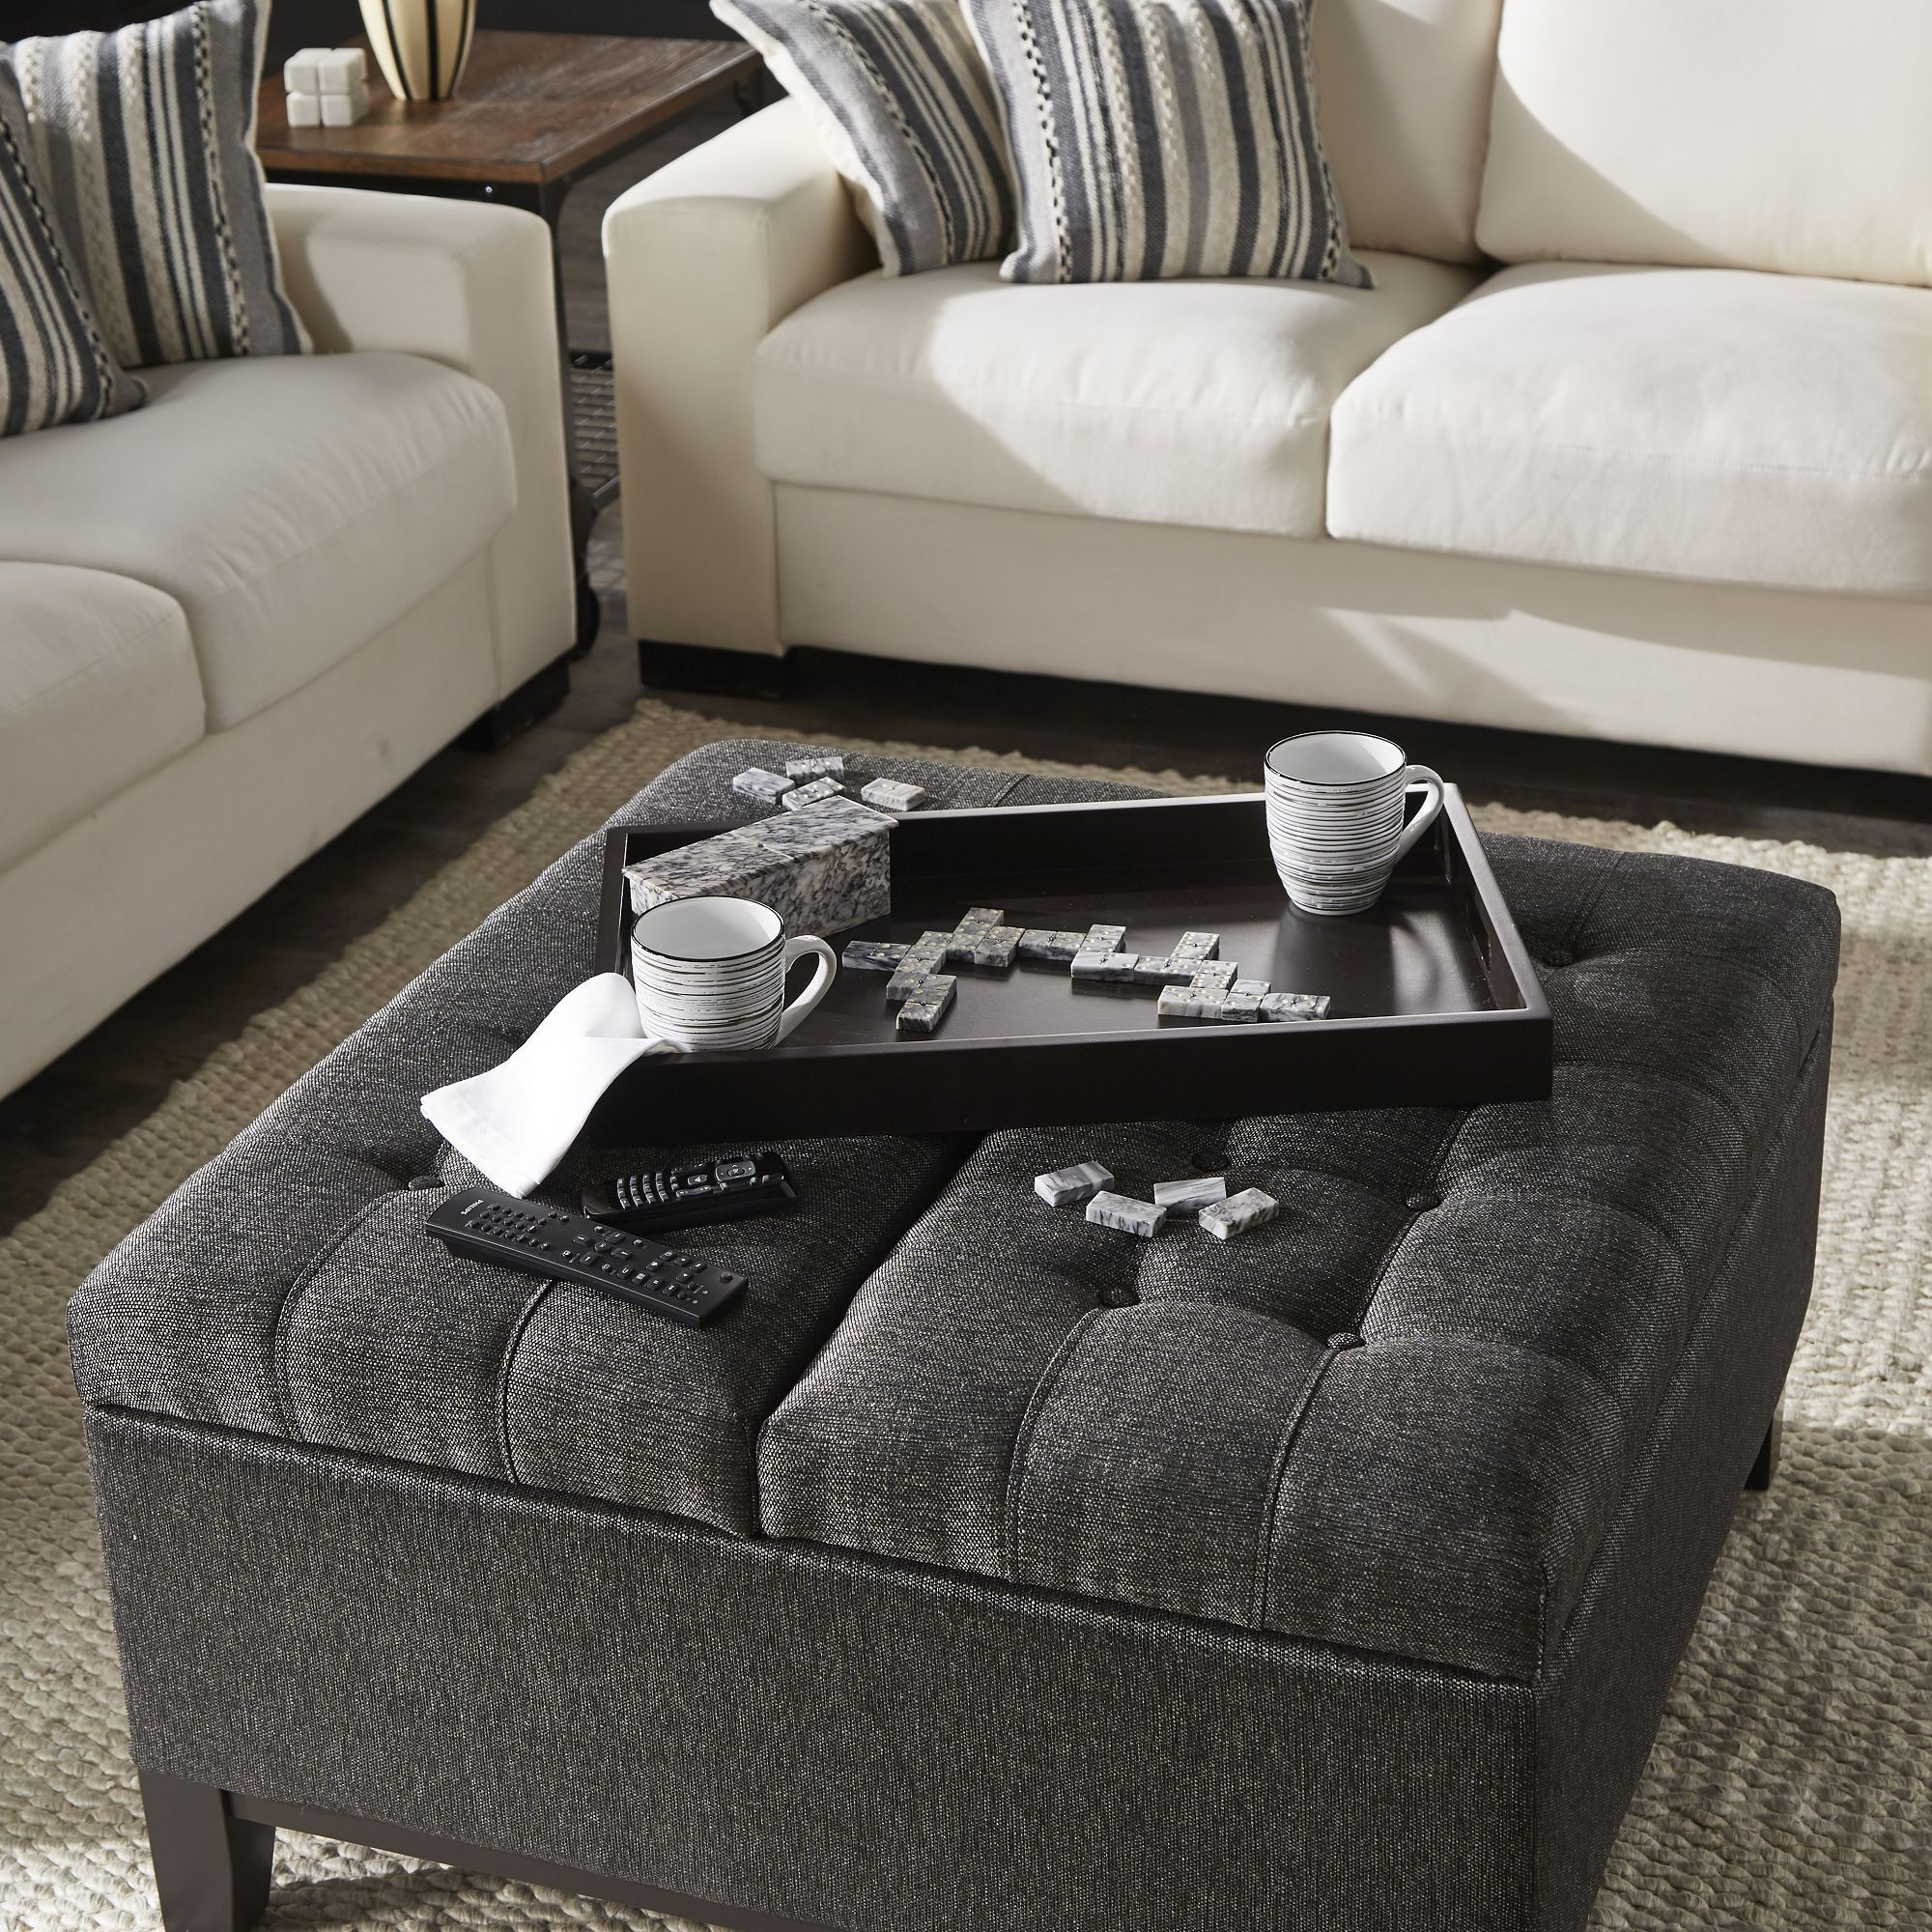 Dark Grey Fabric Lift Top Storage Ottoman With 2 Trays In 2021 Storage Ottoman Coffee Table Storage Ottoman Grey Upholstery [ 2000 x 2000 Pixel ]